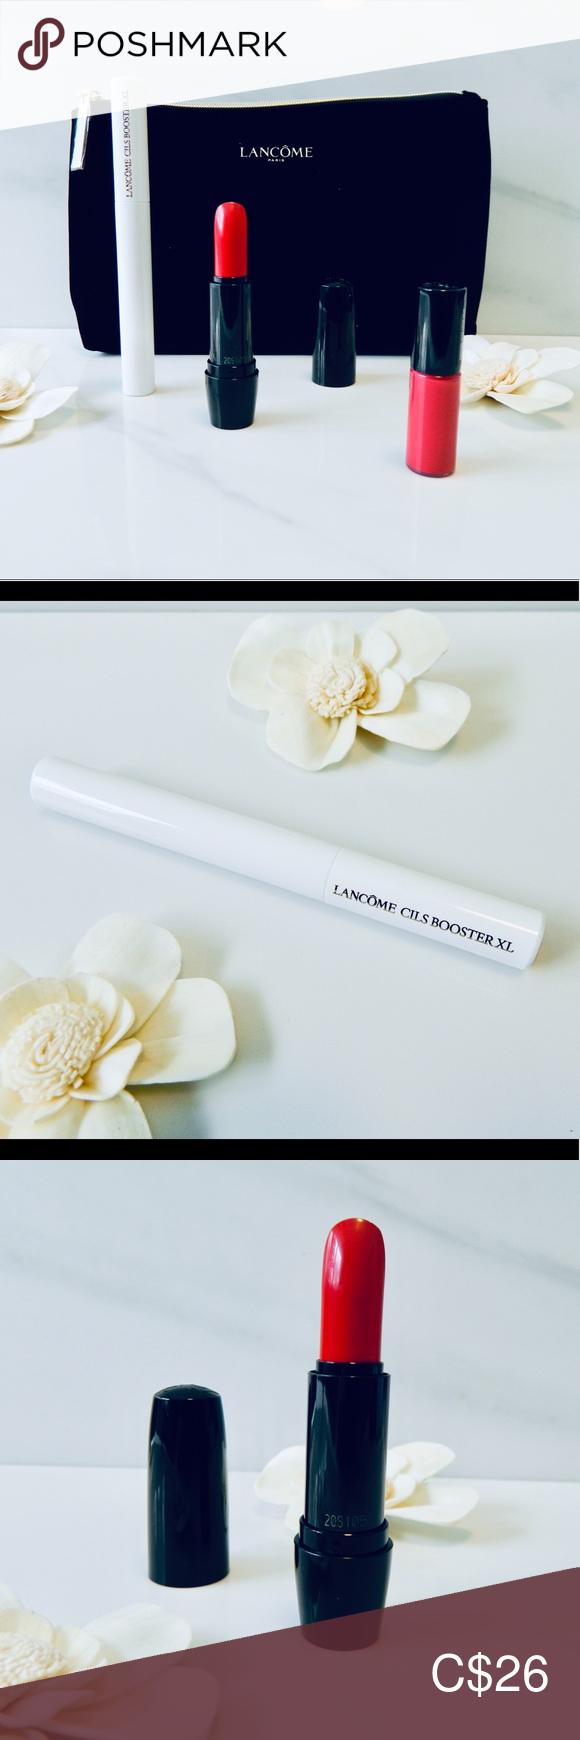 New Lancôme 2 Lip Products, Mascara Primer, Bag NWT in